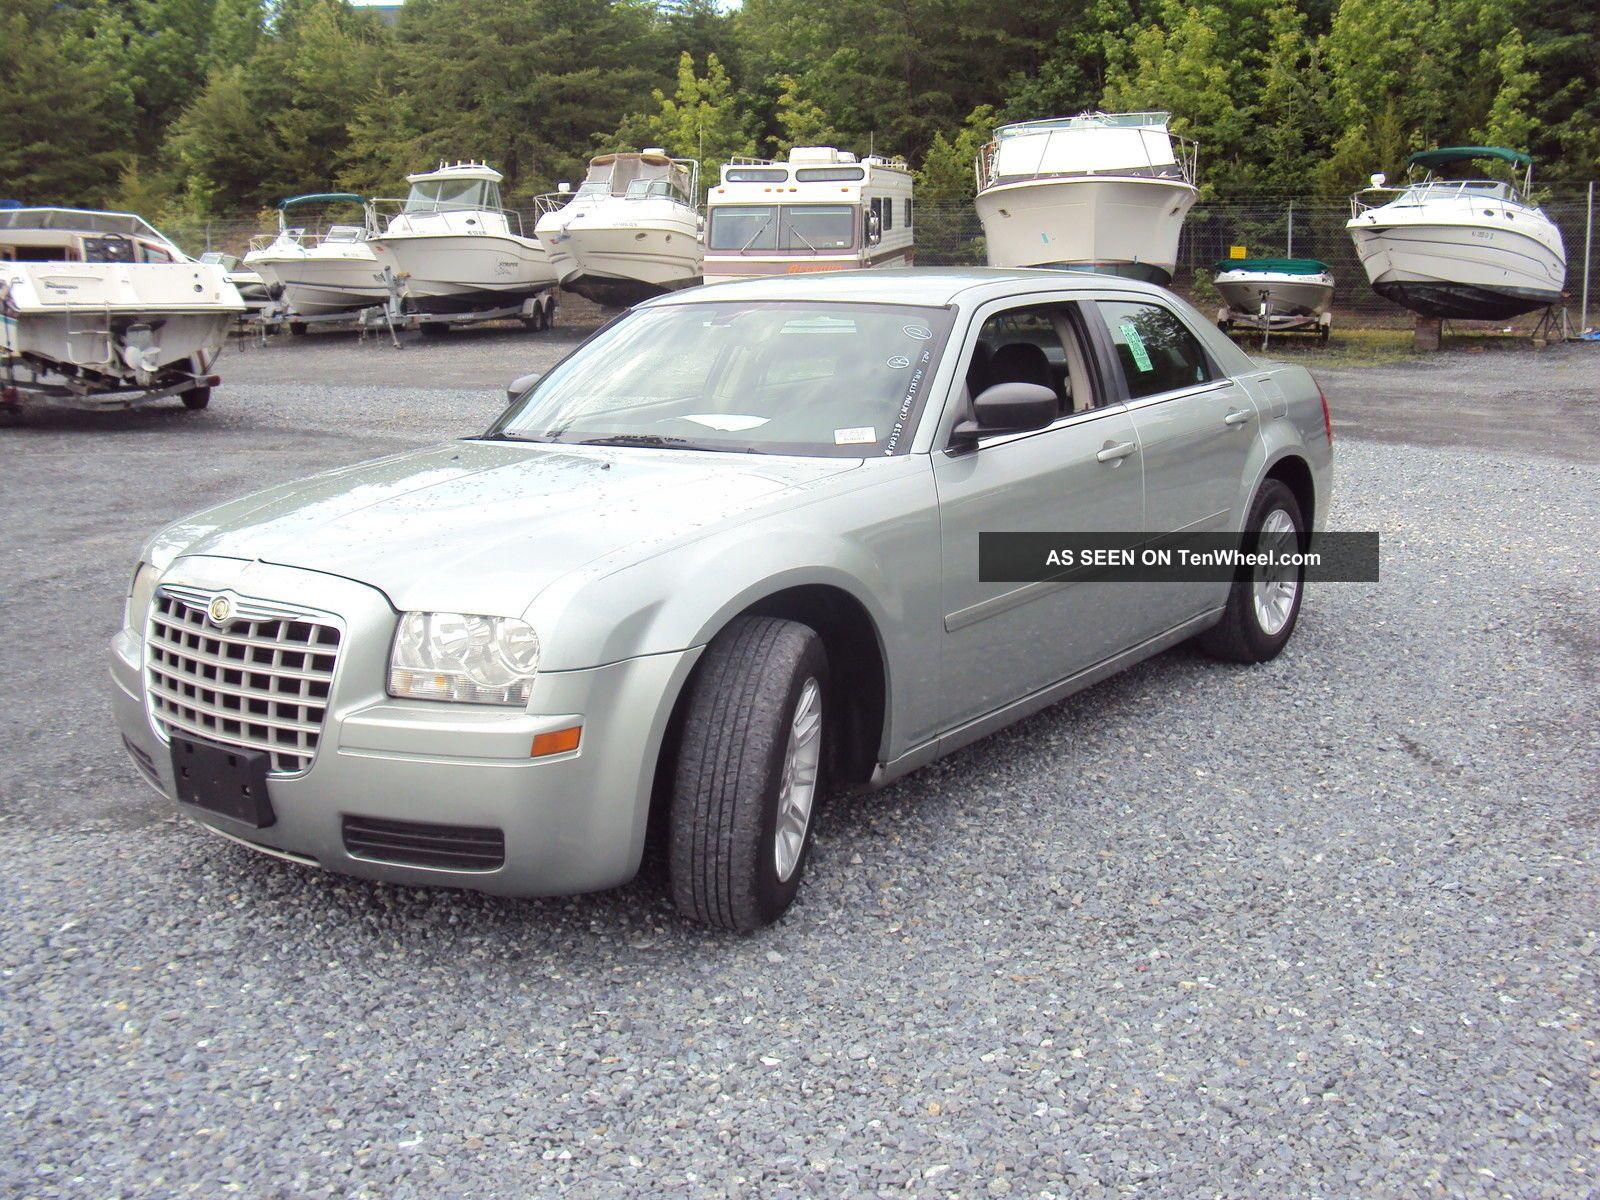 2006 Chrysler 300 Sedan 2.  7l Needs Motor Repair Body Good Looking Fix Other photo